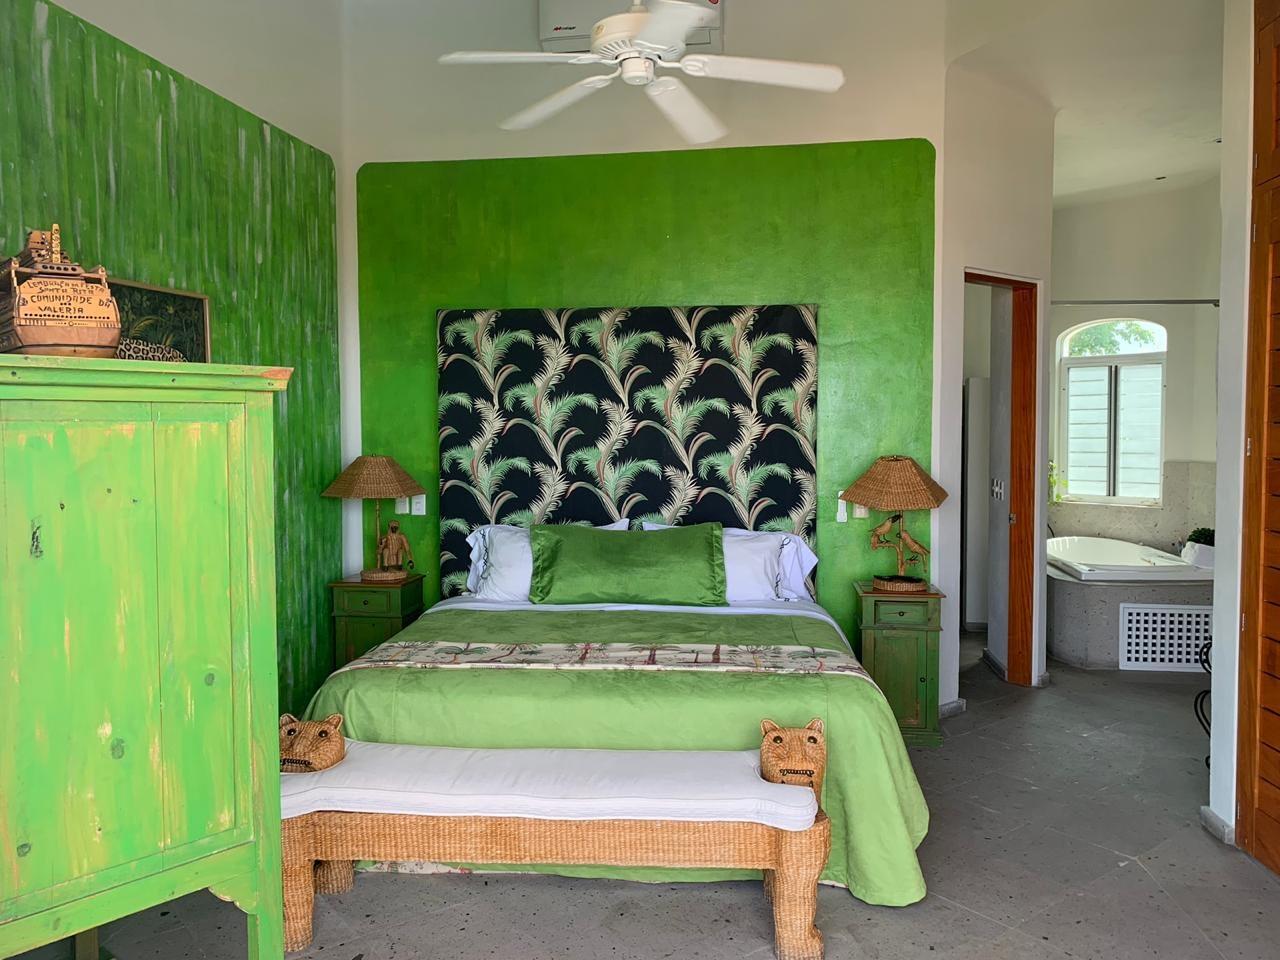 la selva bedroom